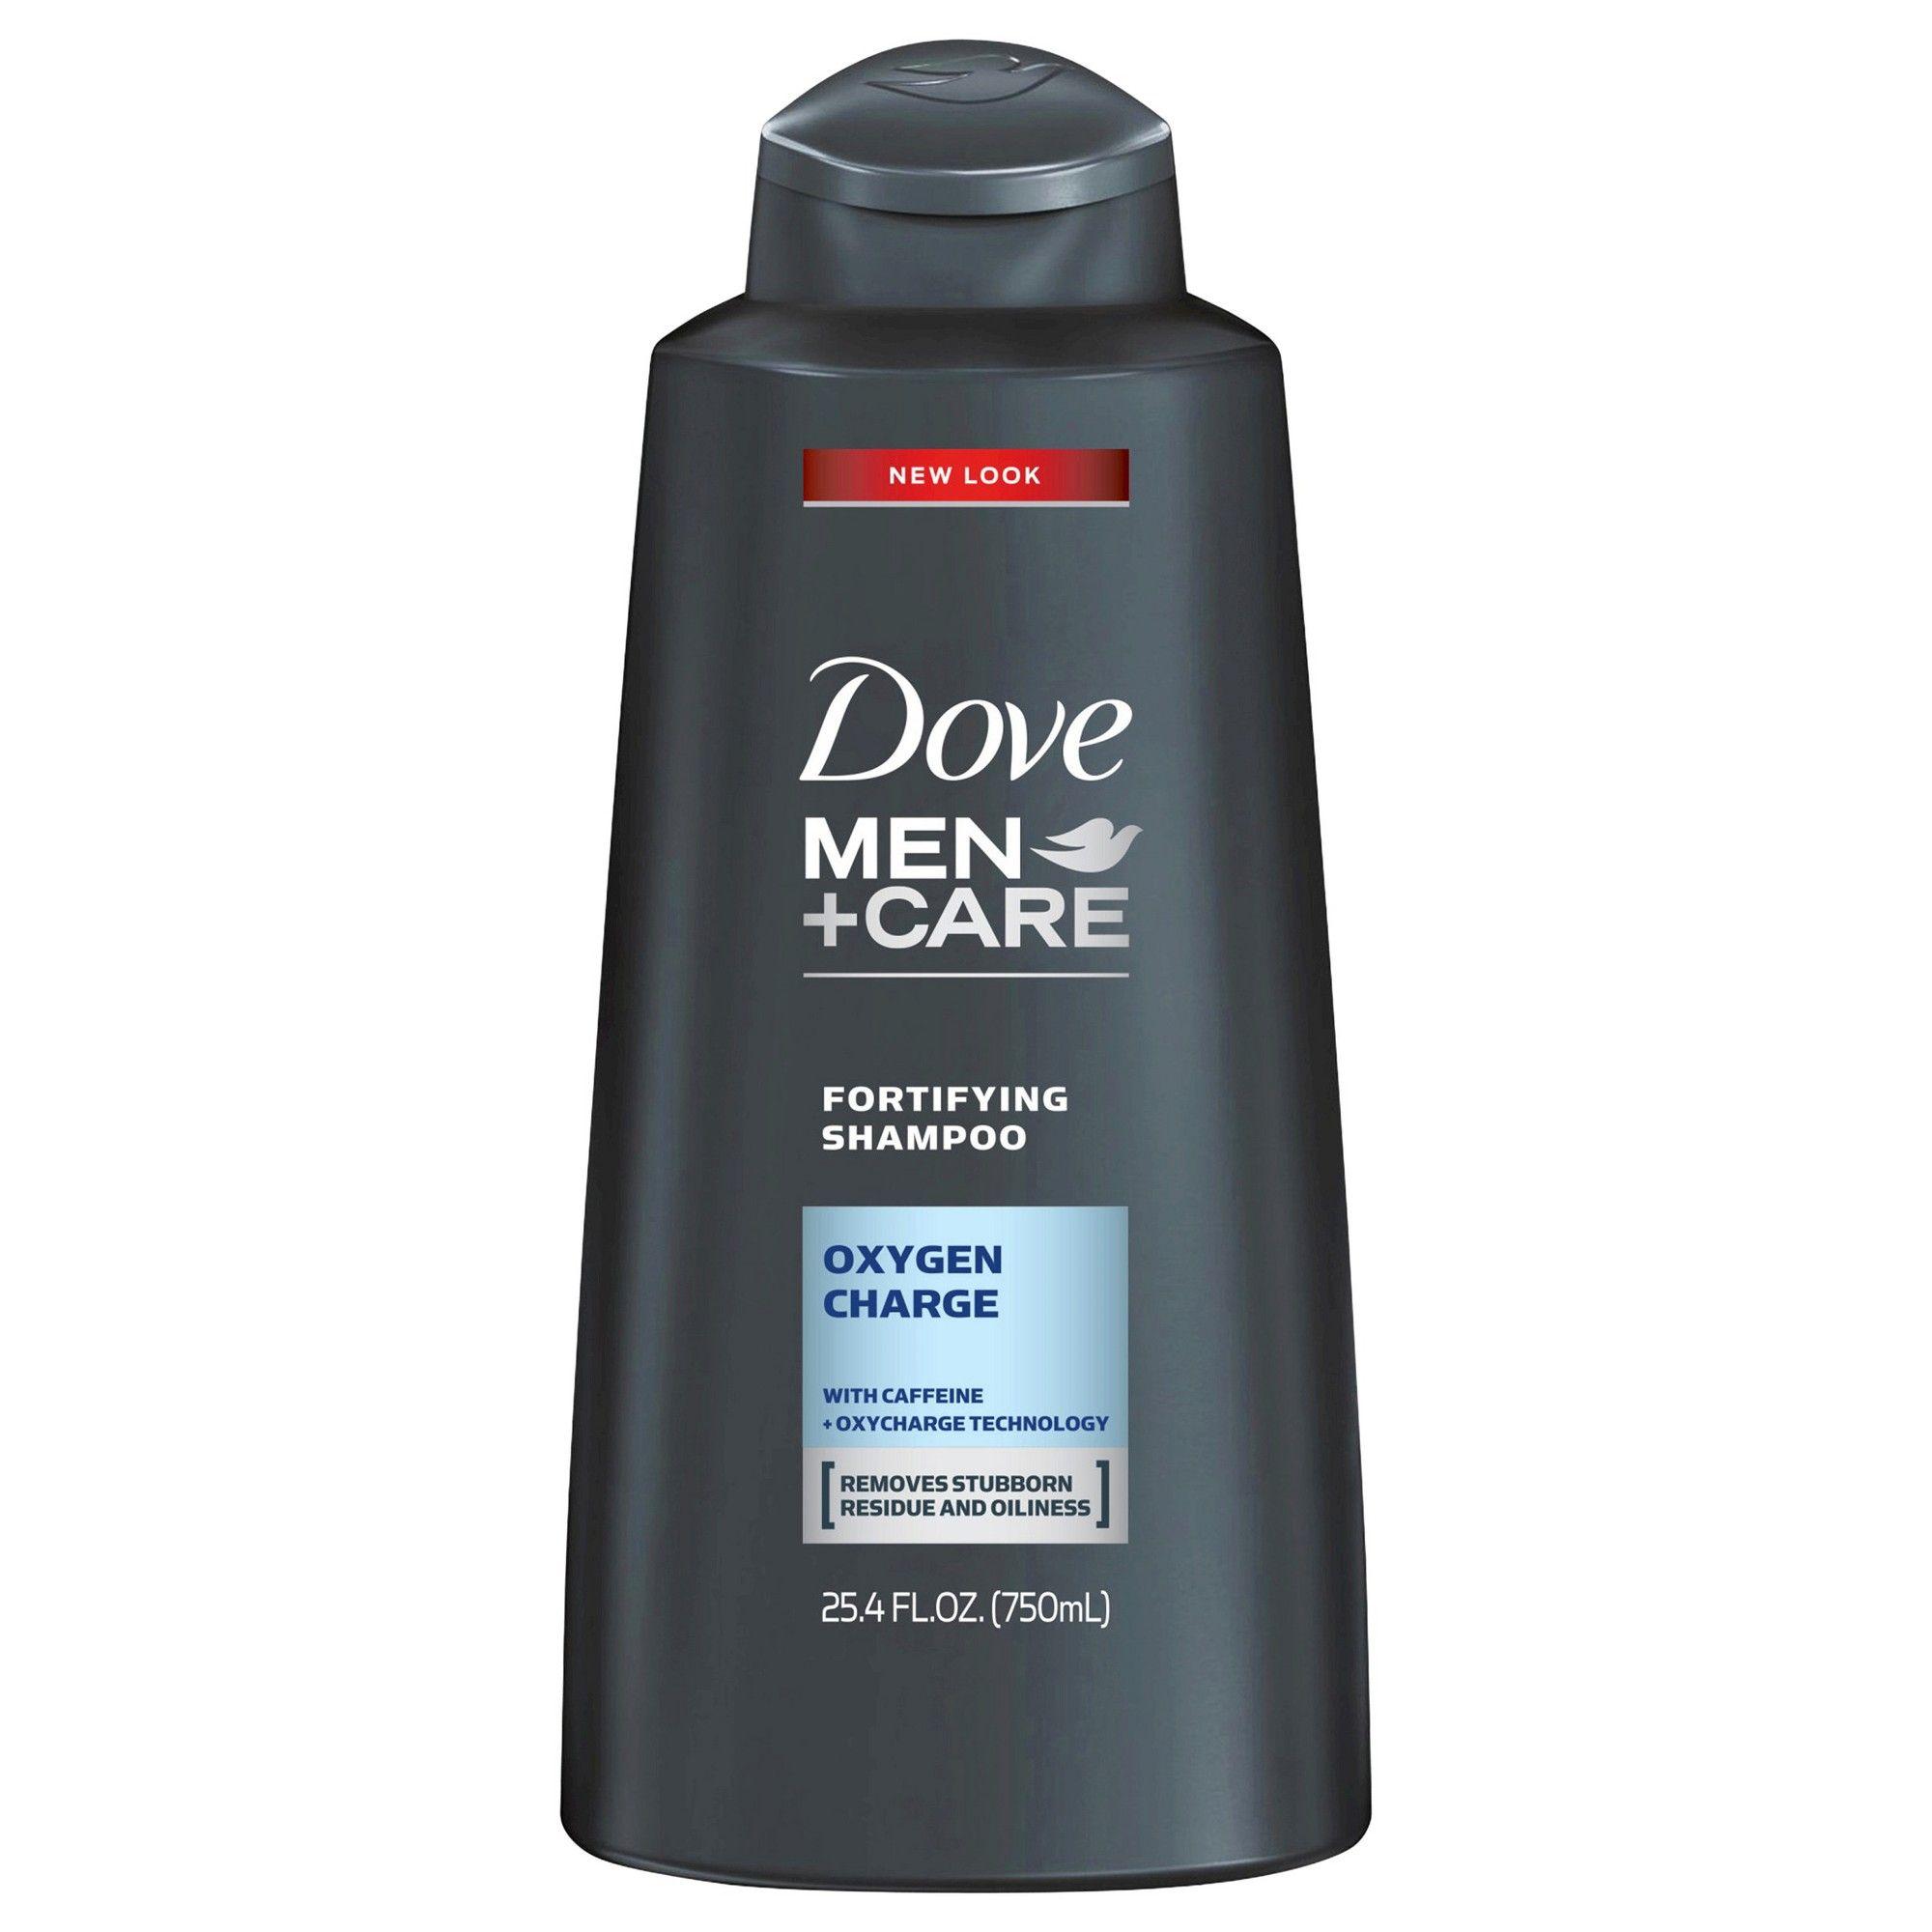 dove men care shoo oxygen charge 25 4 fl oz dove men care